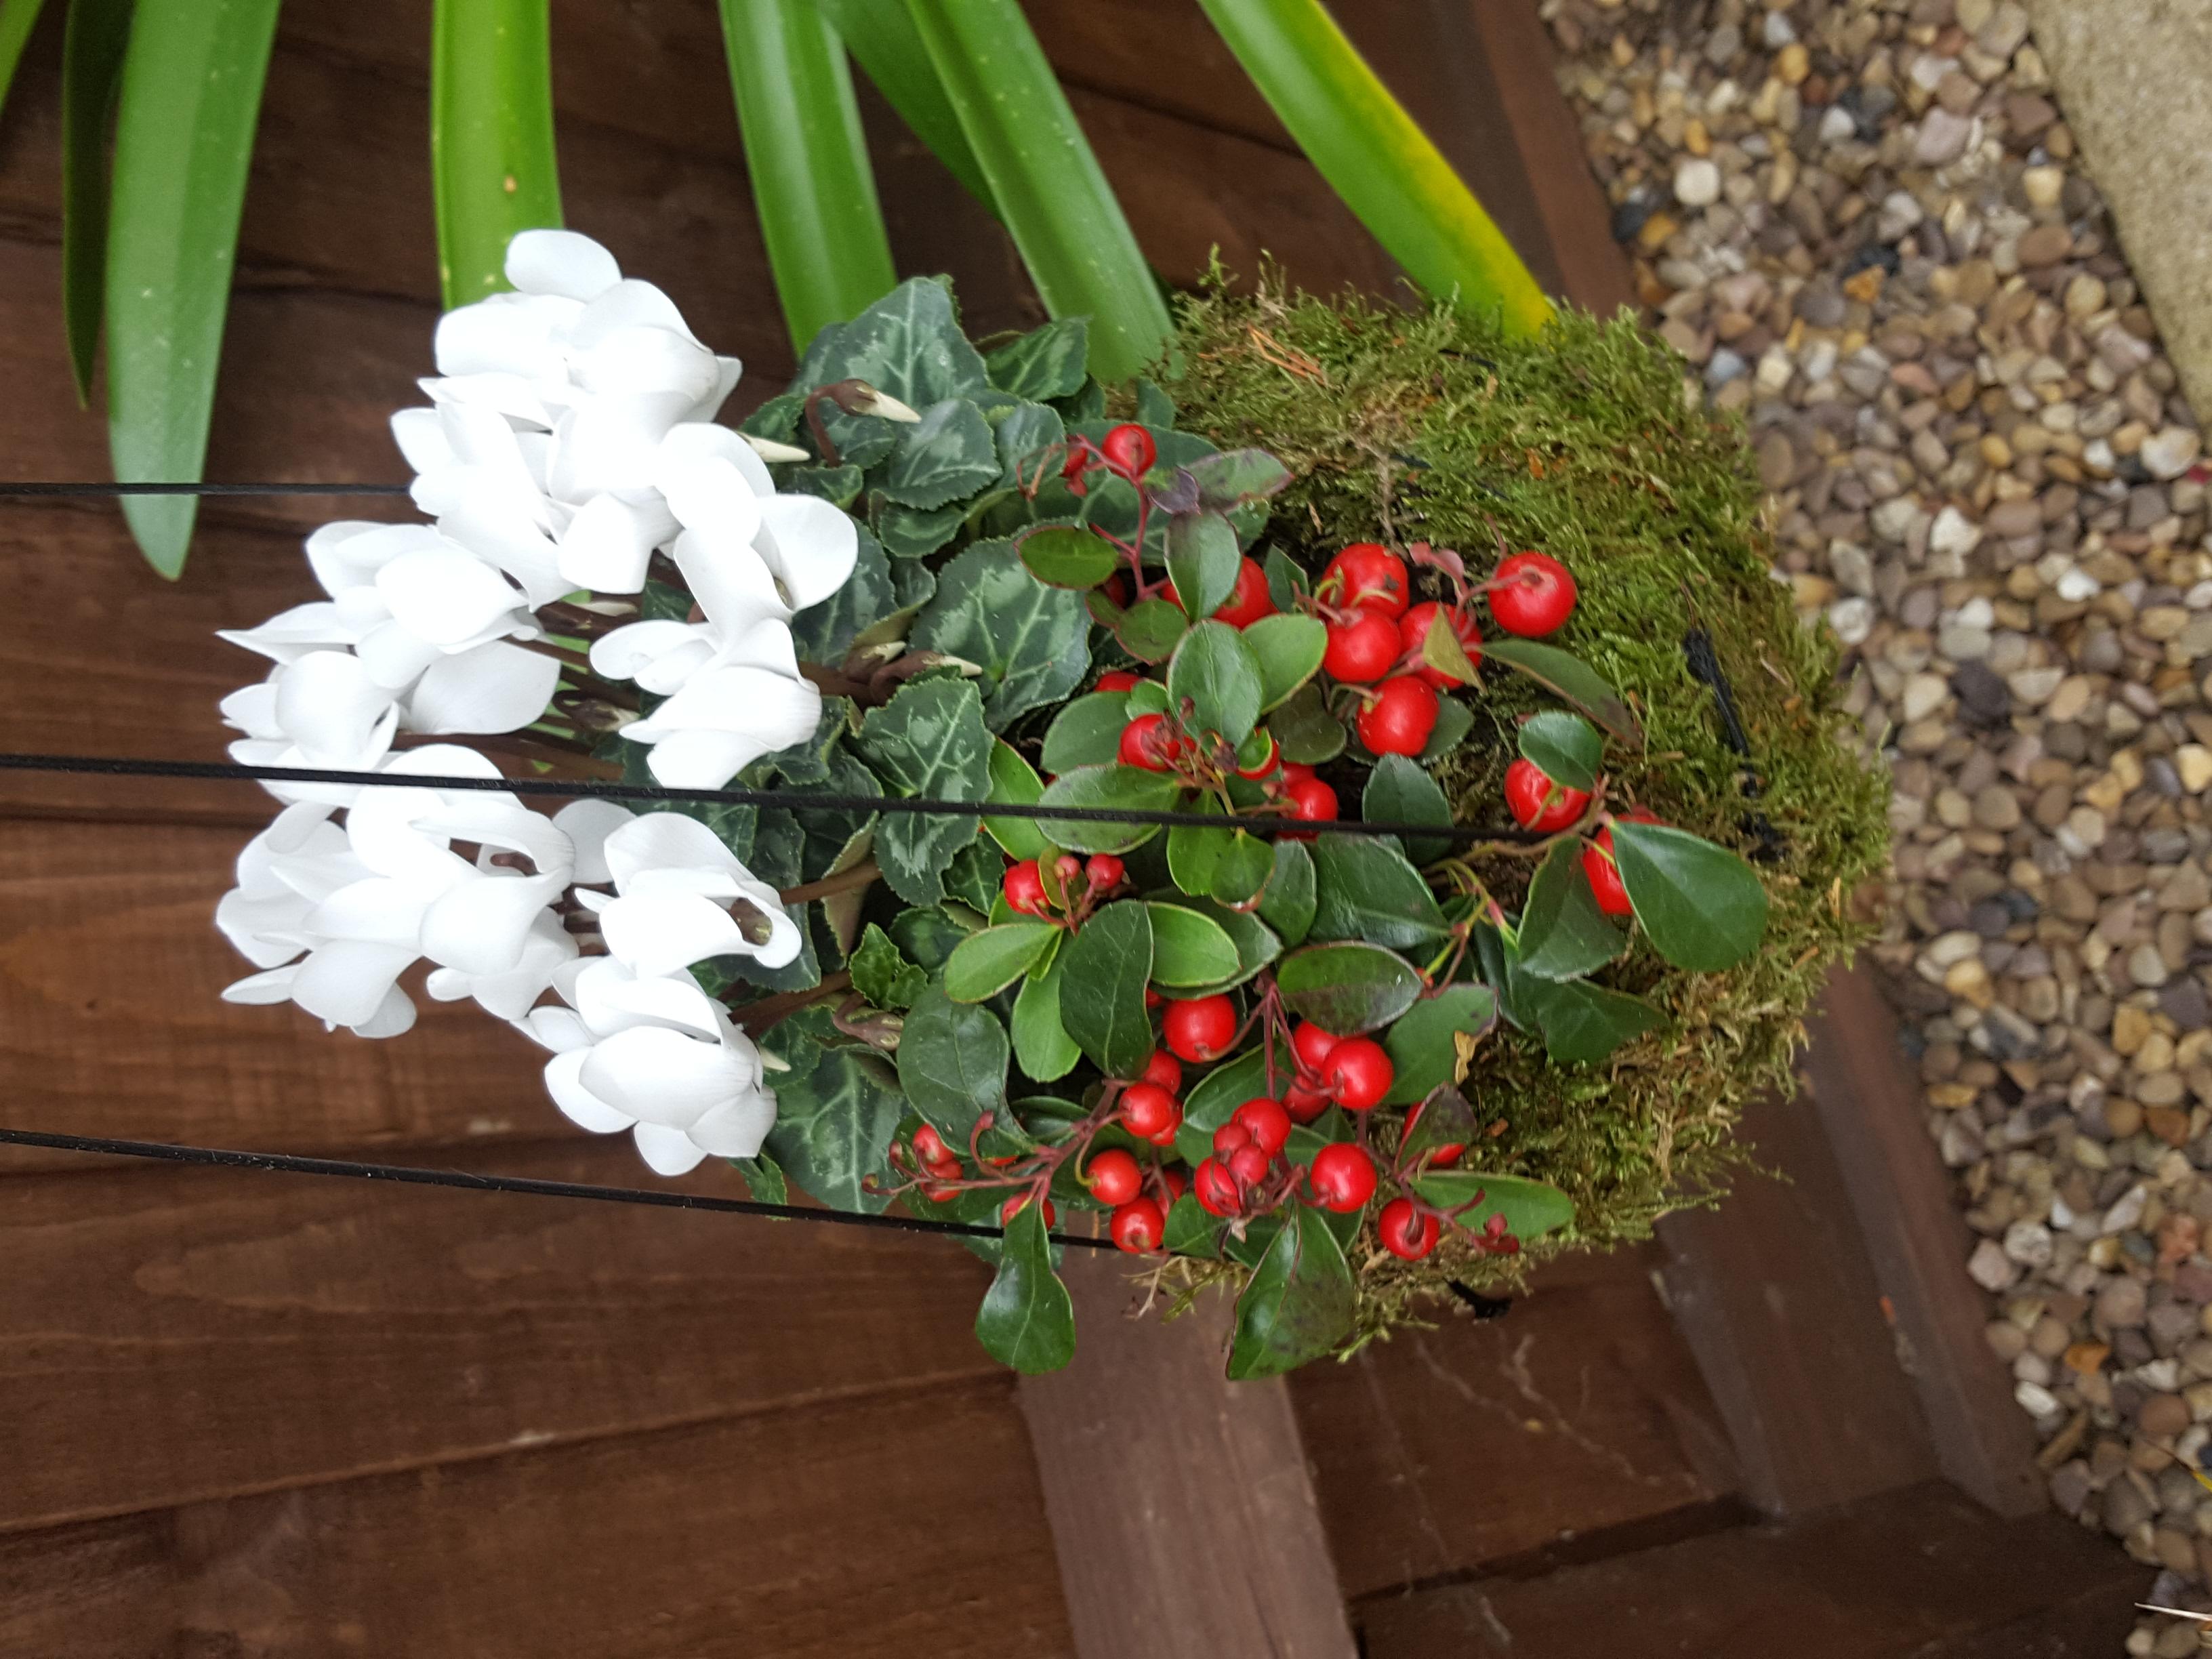 Mixed winter planting